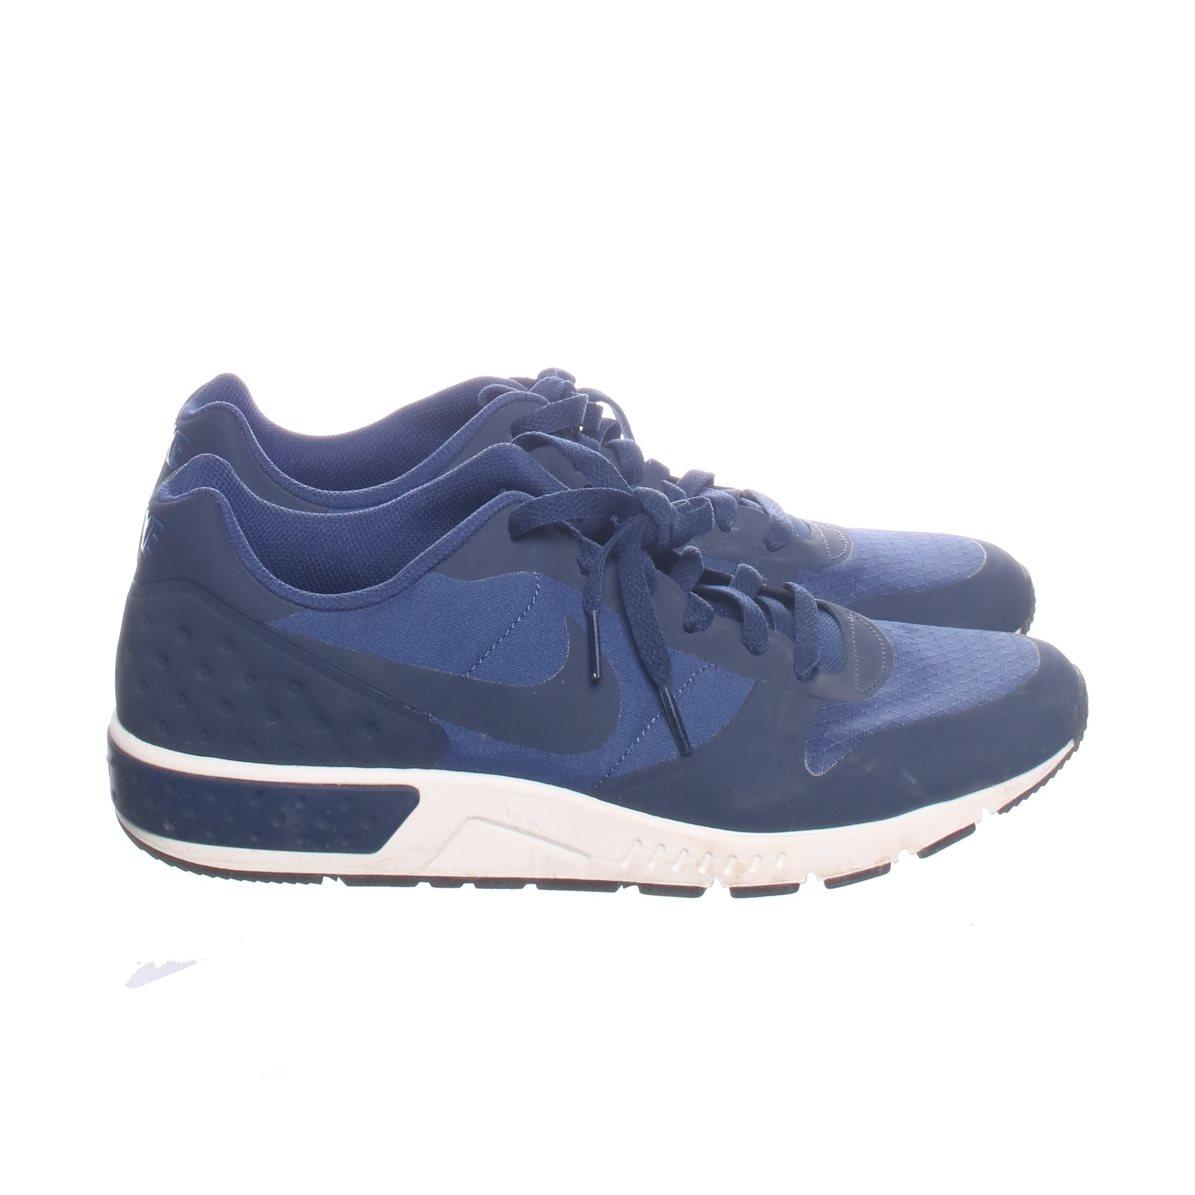 new products 50ed3 098d9 Nike, Sneakers, Strl  42,5, Nightgazer LW, Blå Svart